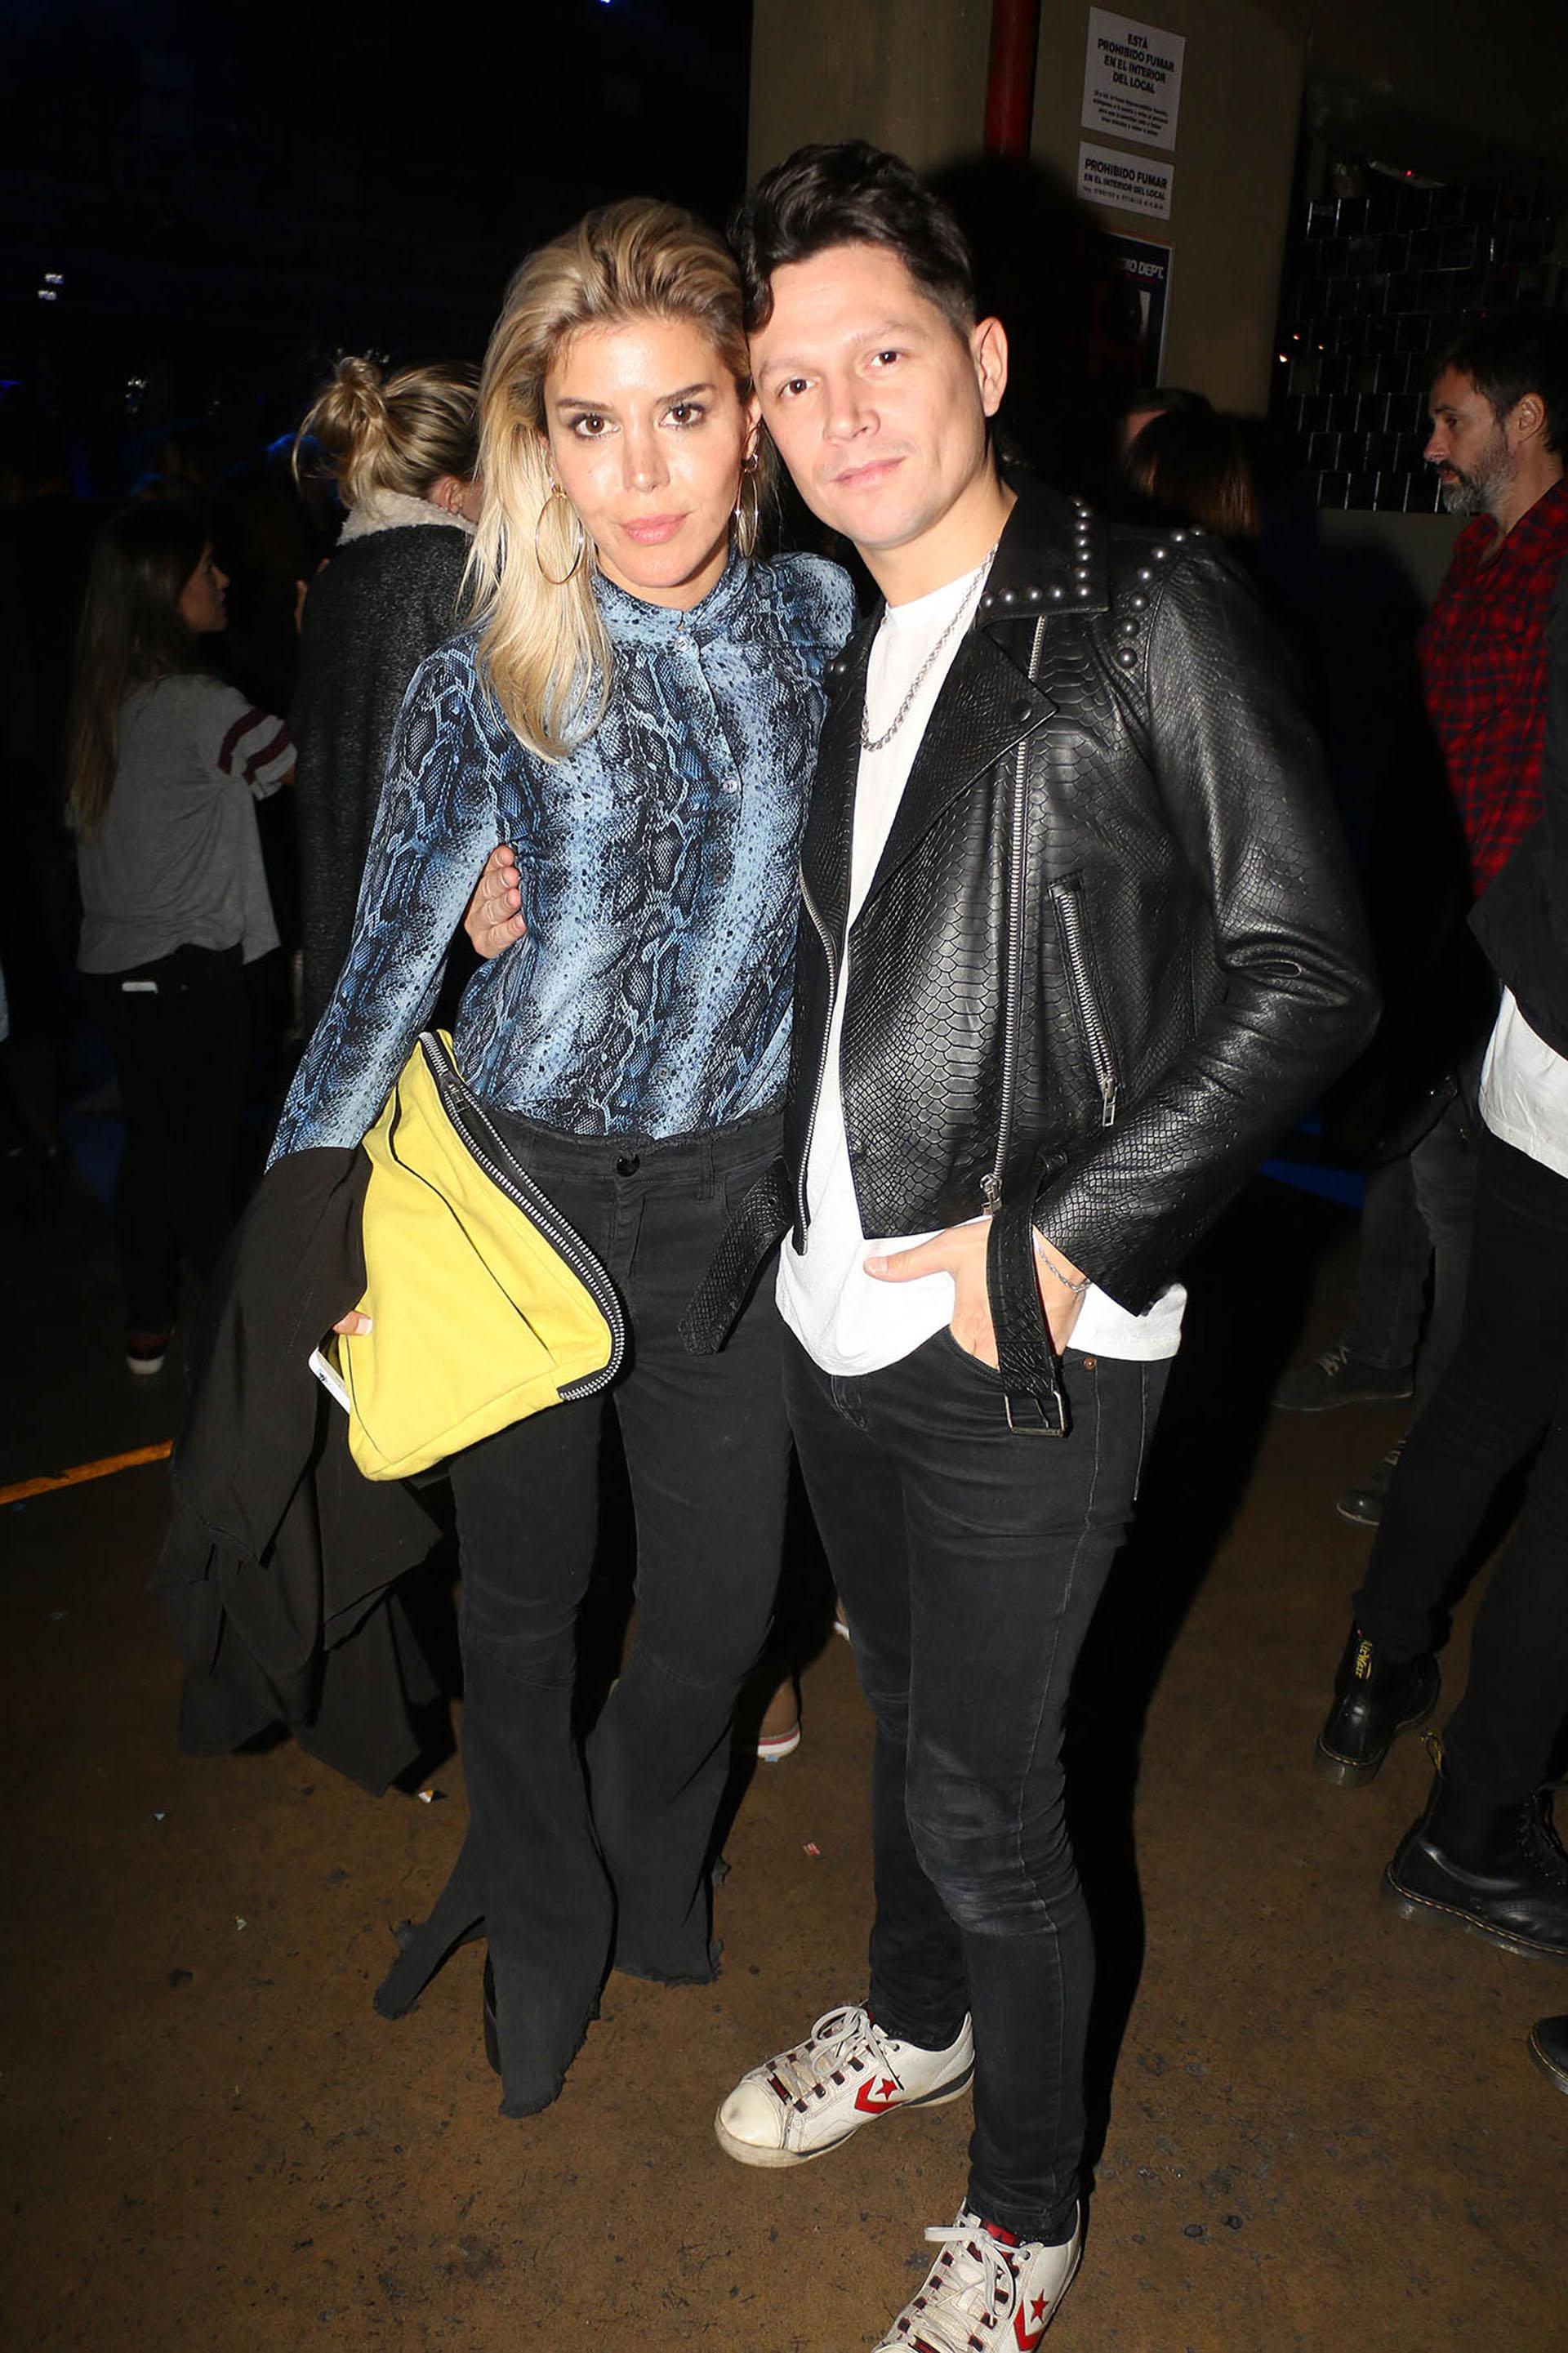 Piru Saez y su novia Denise Romano